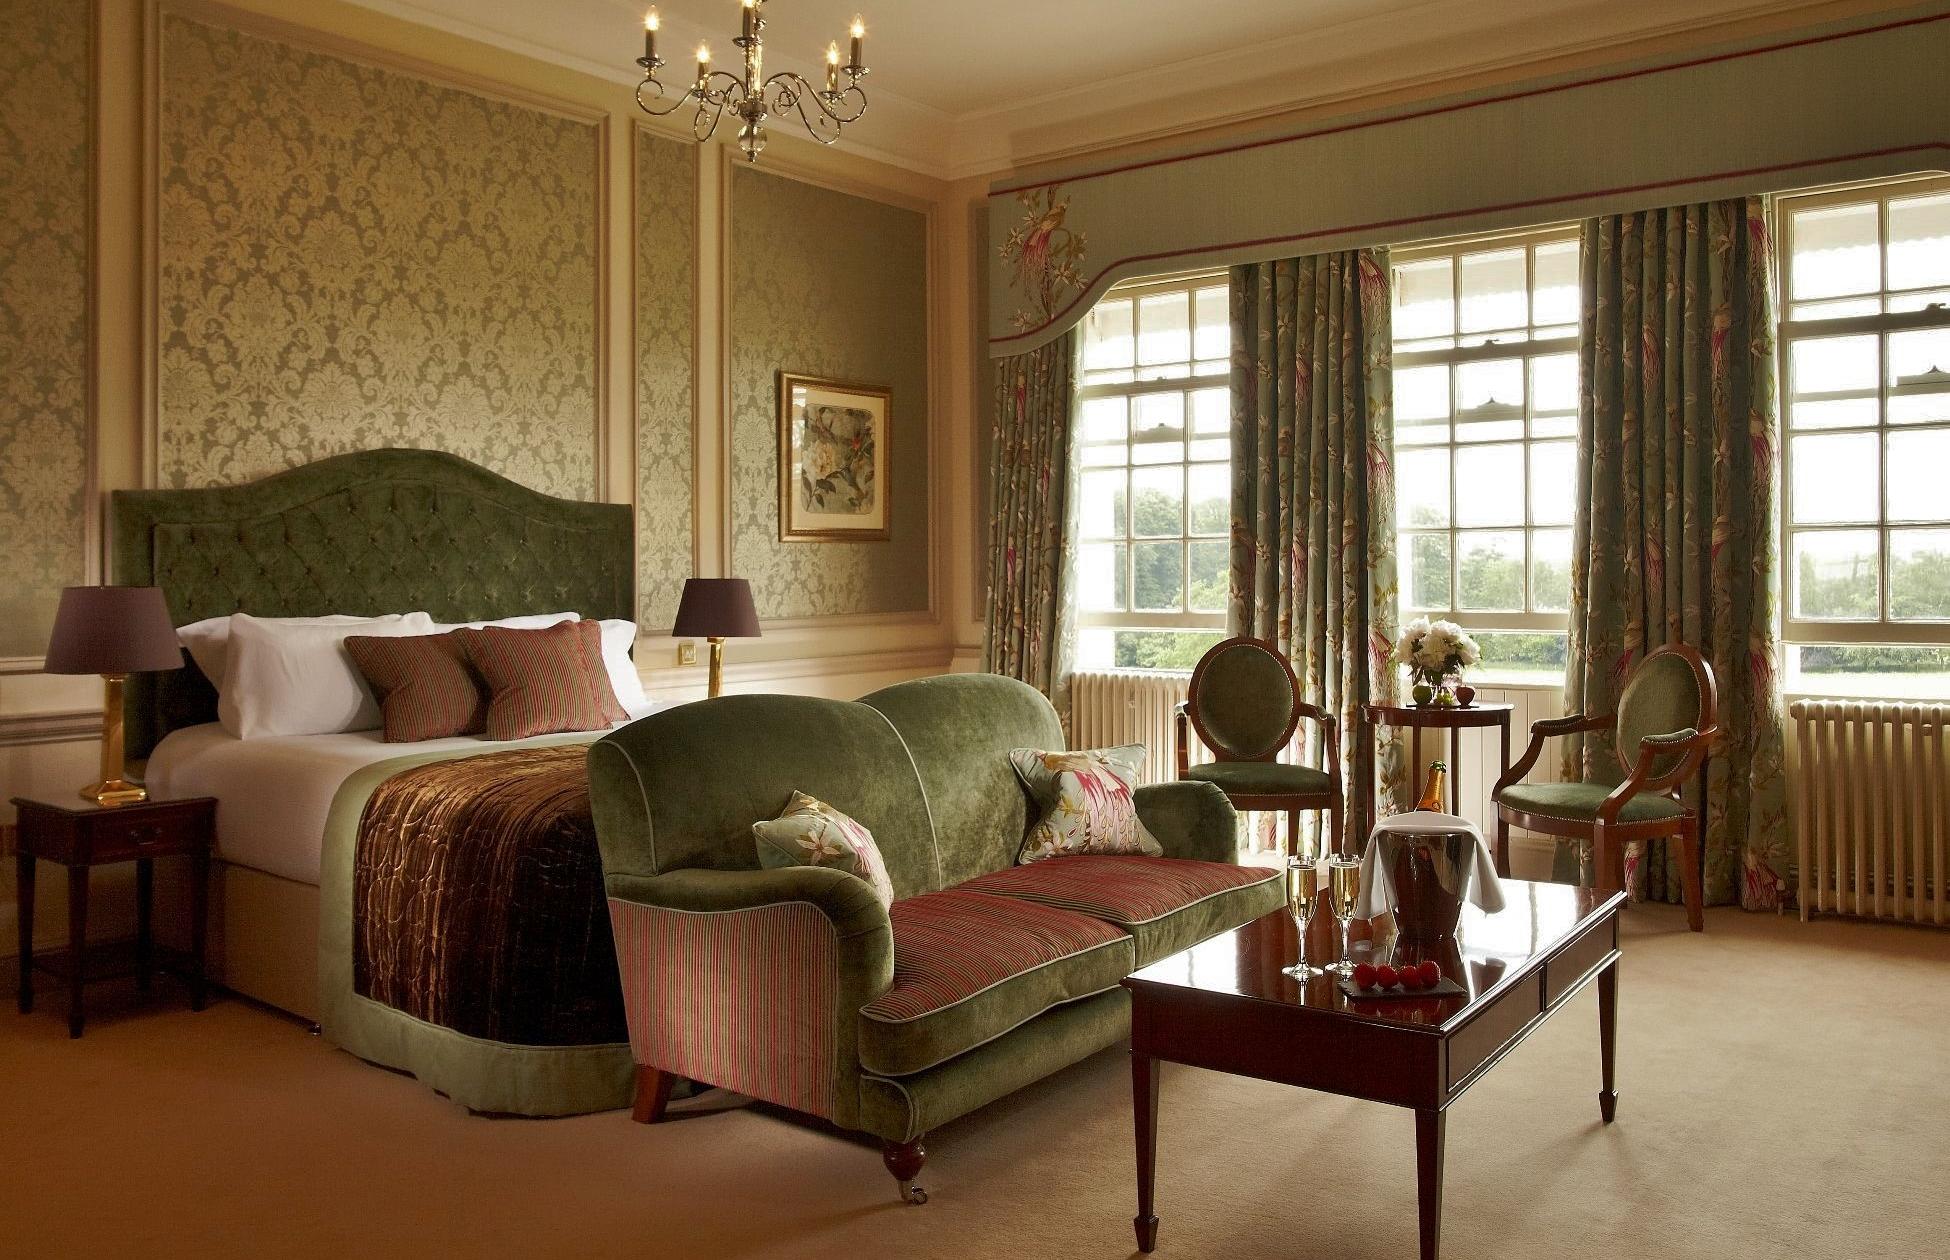 Eden Hotels-Brockencote Hall-12-06-12 10566 lr.jpg